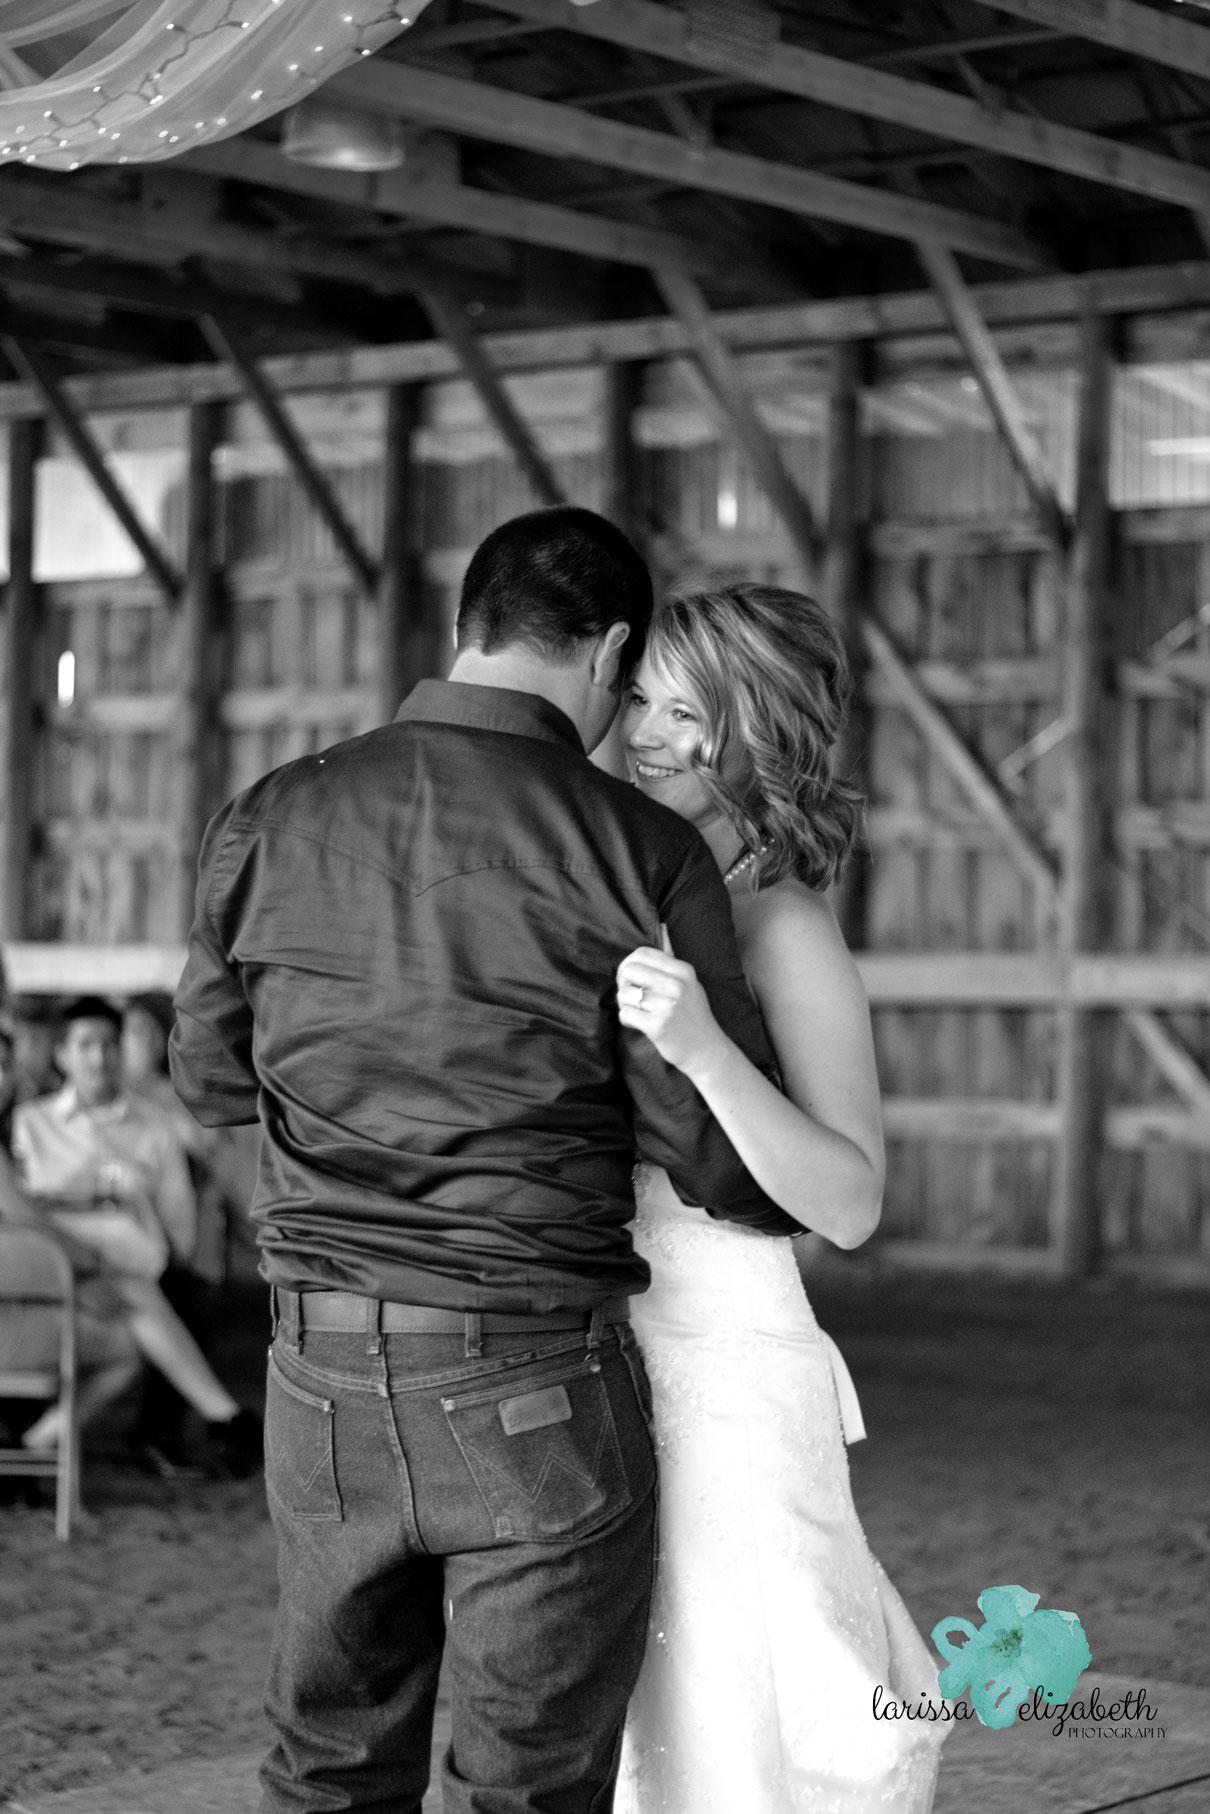 Country-Dance-2.jpg